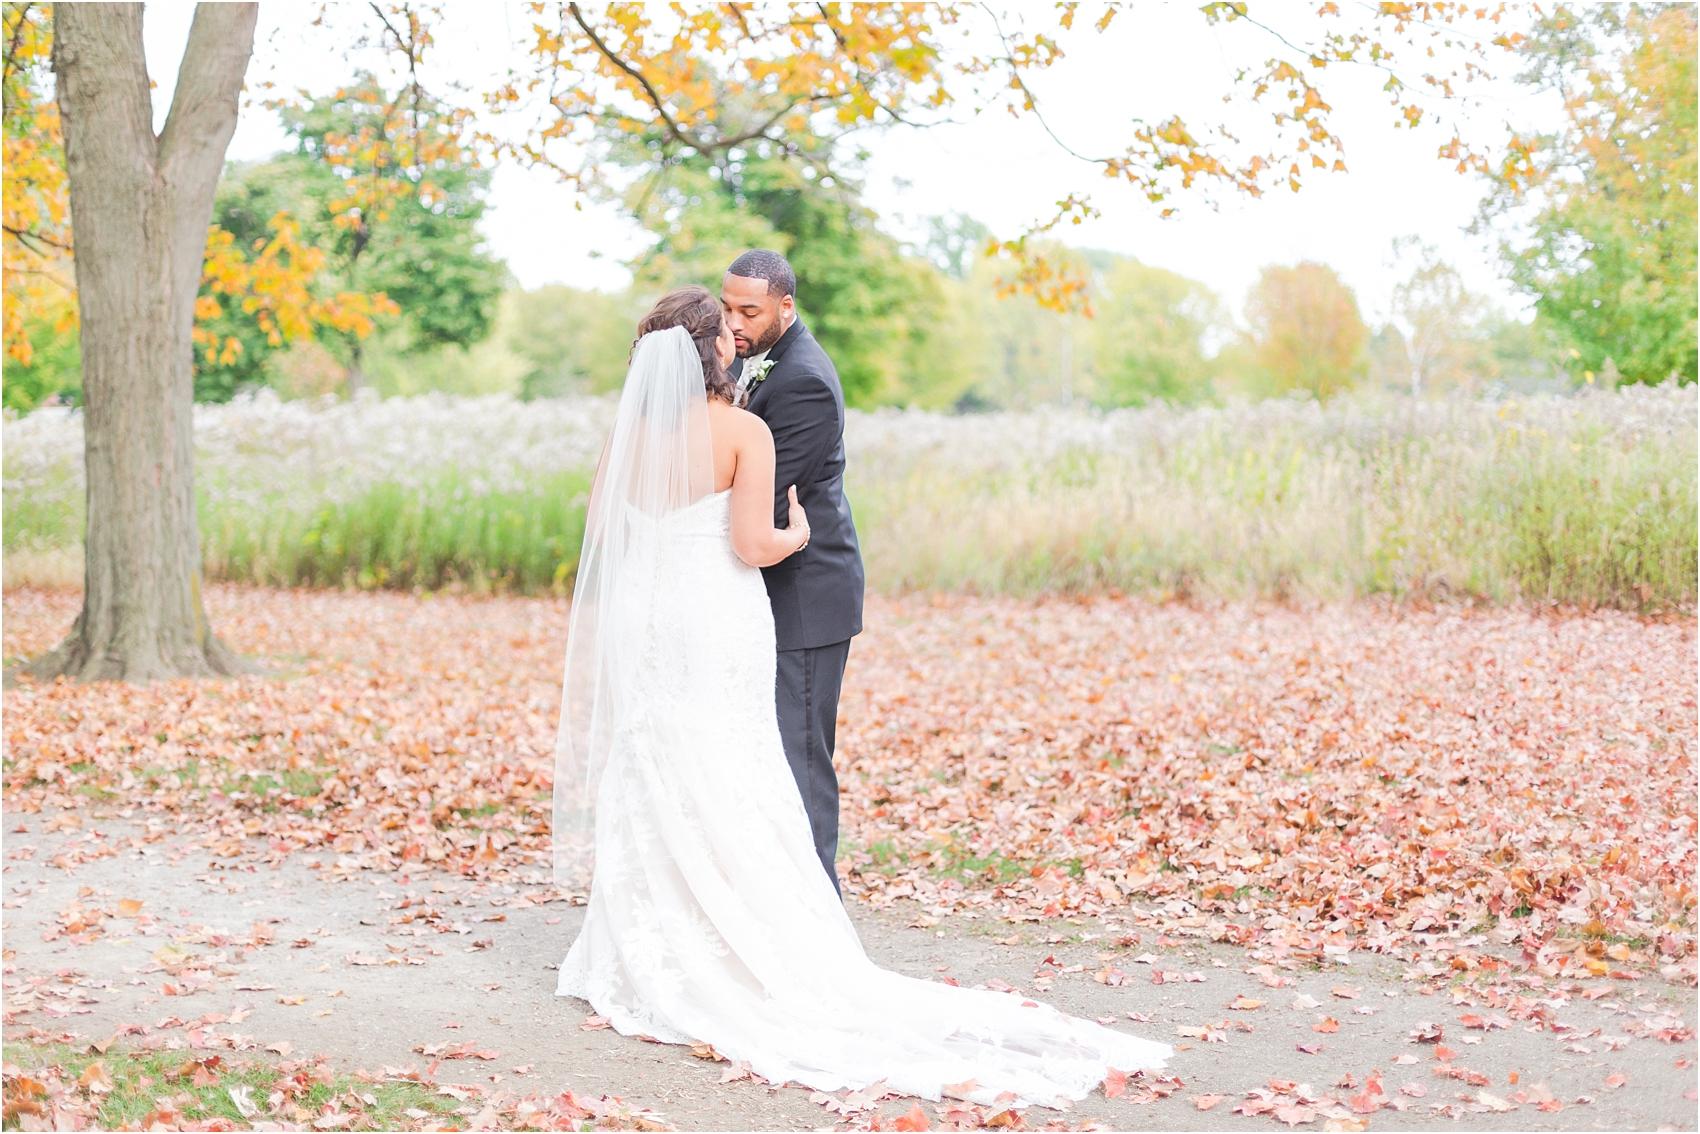 elegant-and-romantic-fall-wedding-photos-at-st-marys-catholic-church-in-monroe-michigan-by-courtney-carolyn-photography_0059.jpg